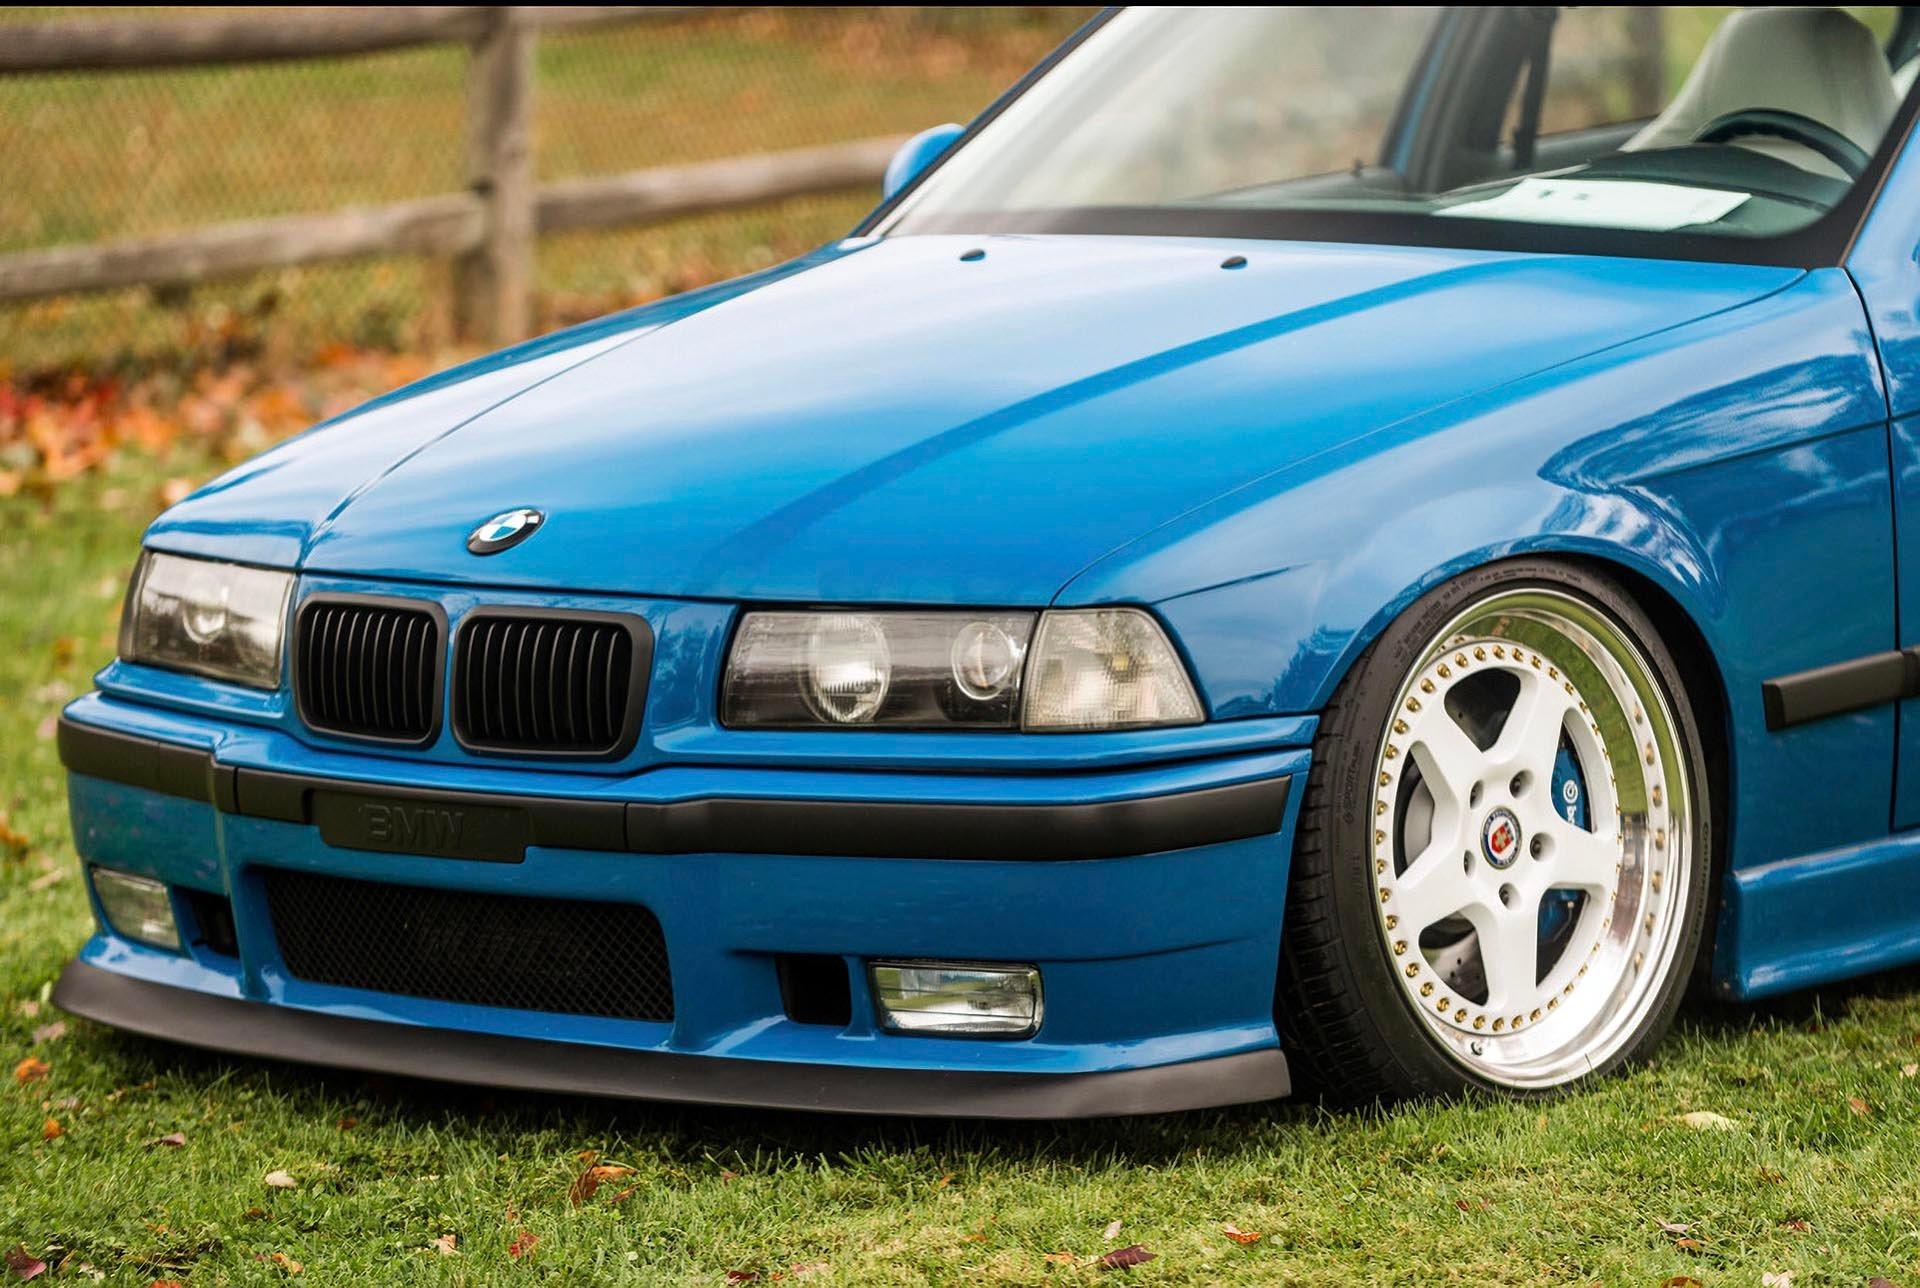 Laguna Seca Blue E36 M3 front detail